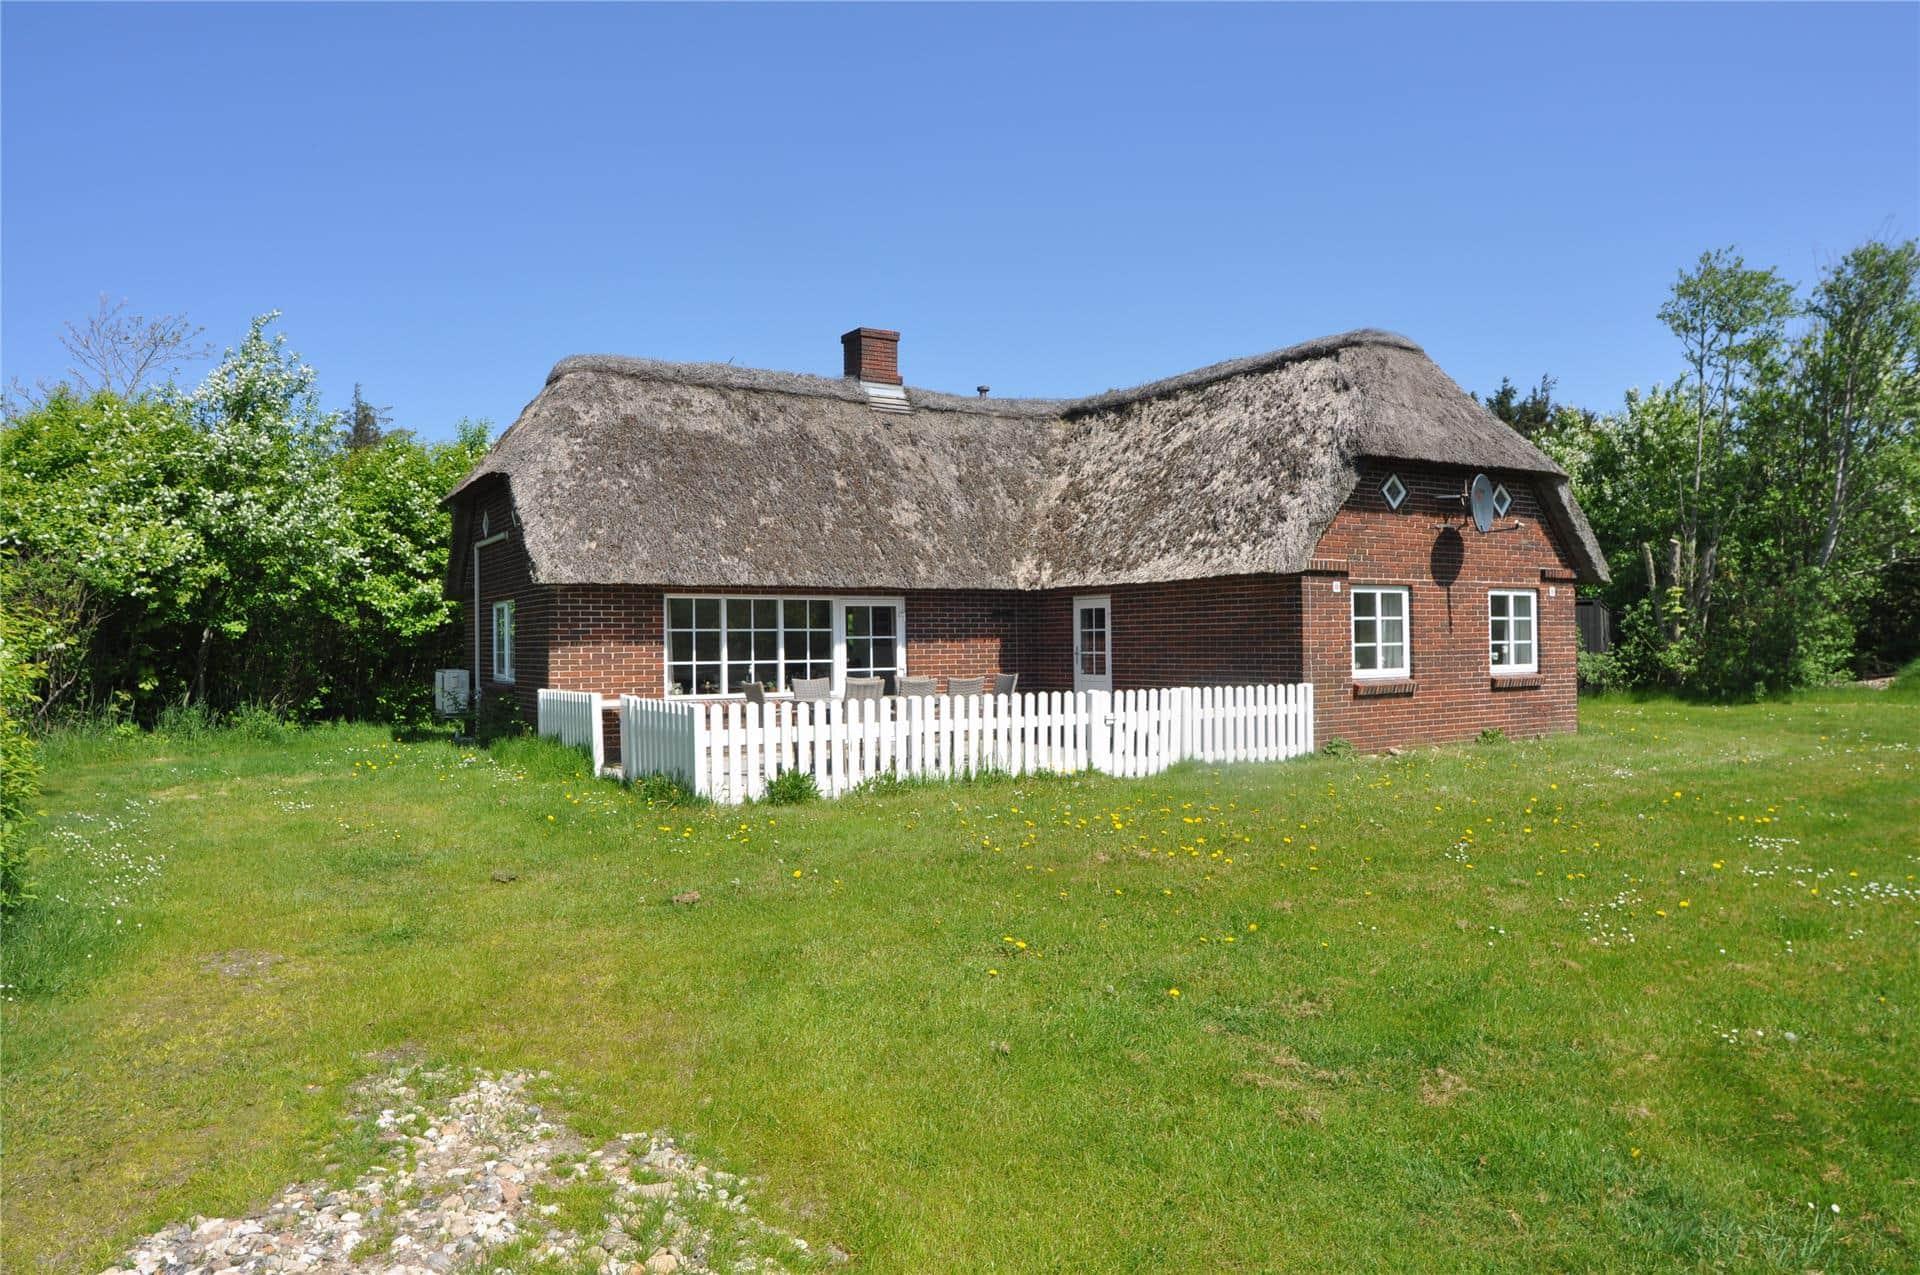 Bild 1-175 Ferienhaus 10170, Kjærgaardvej 2, DK - 6990 Ulfborg